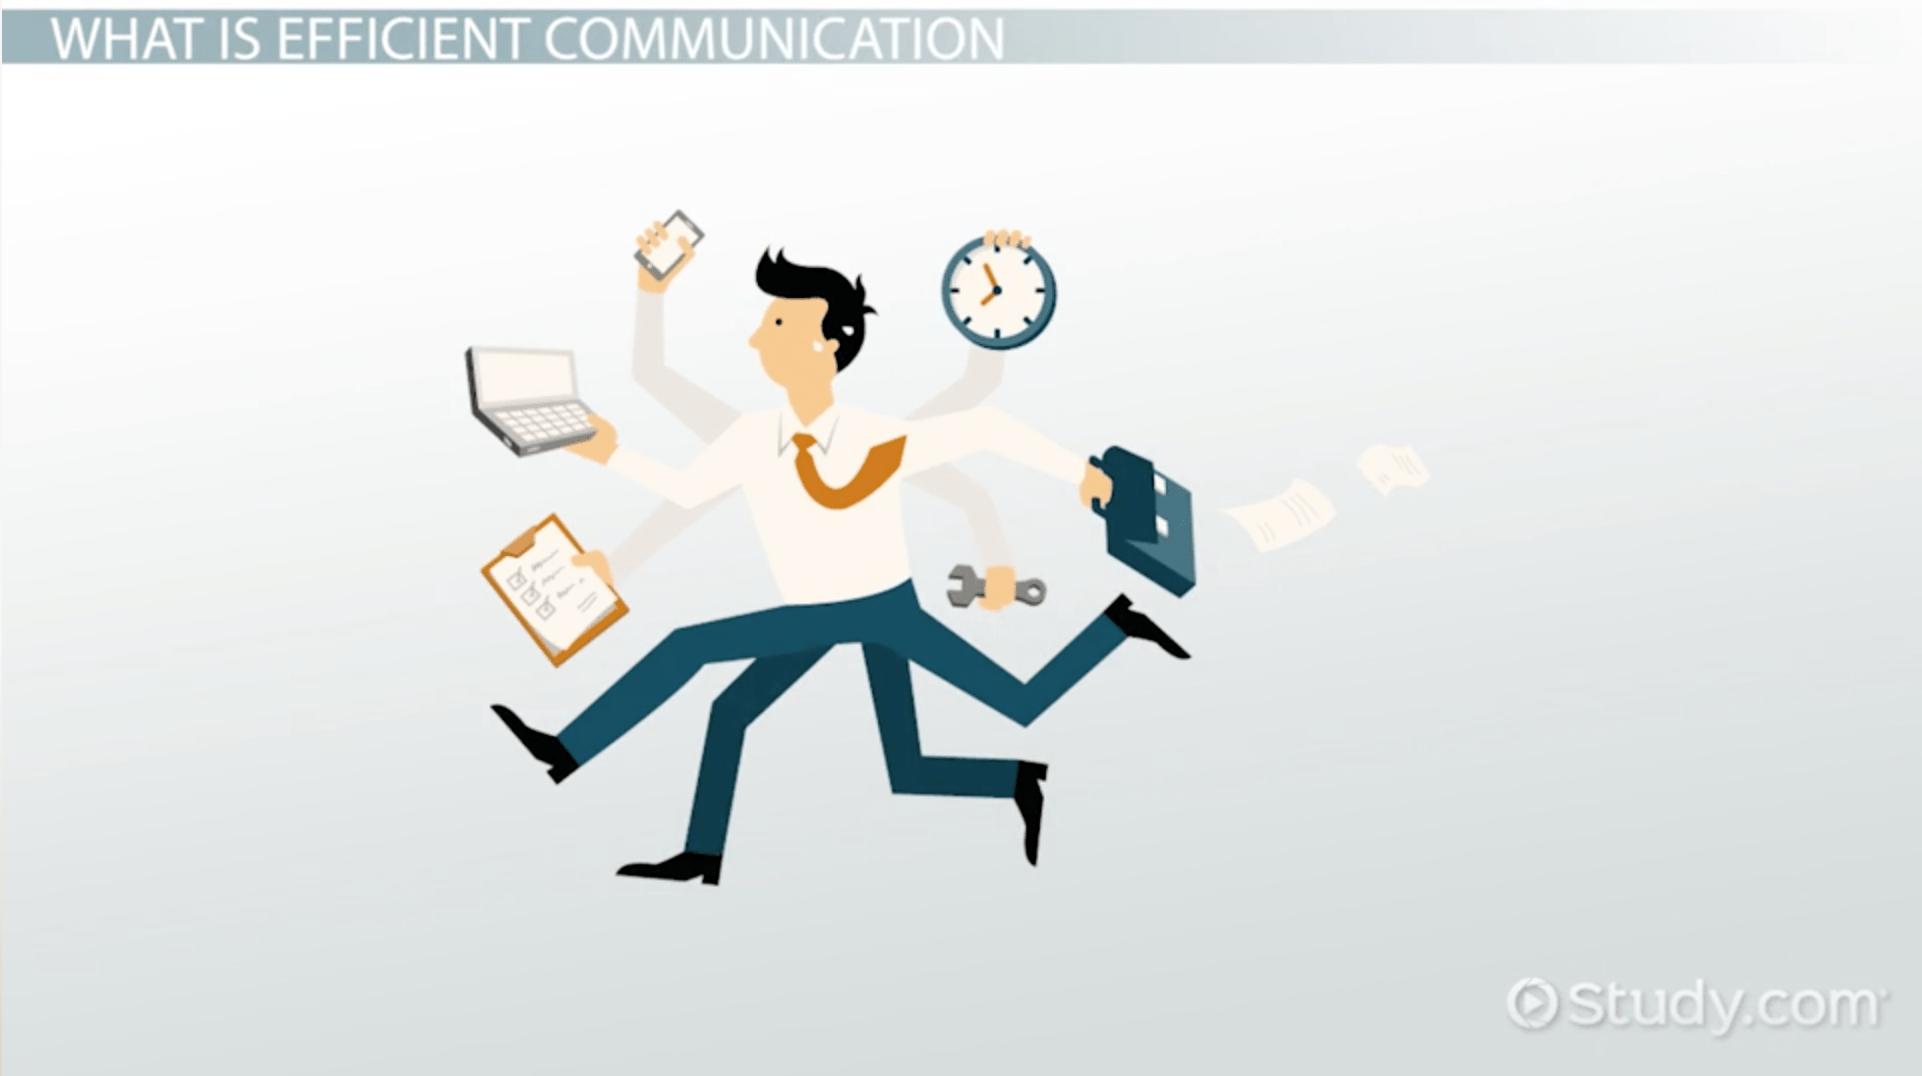 What Is Efficient Communication